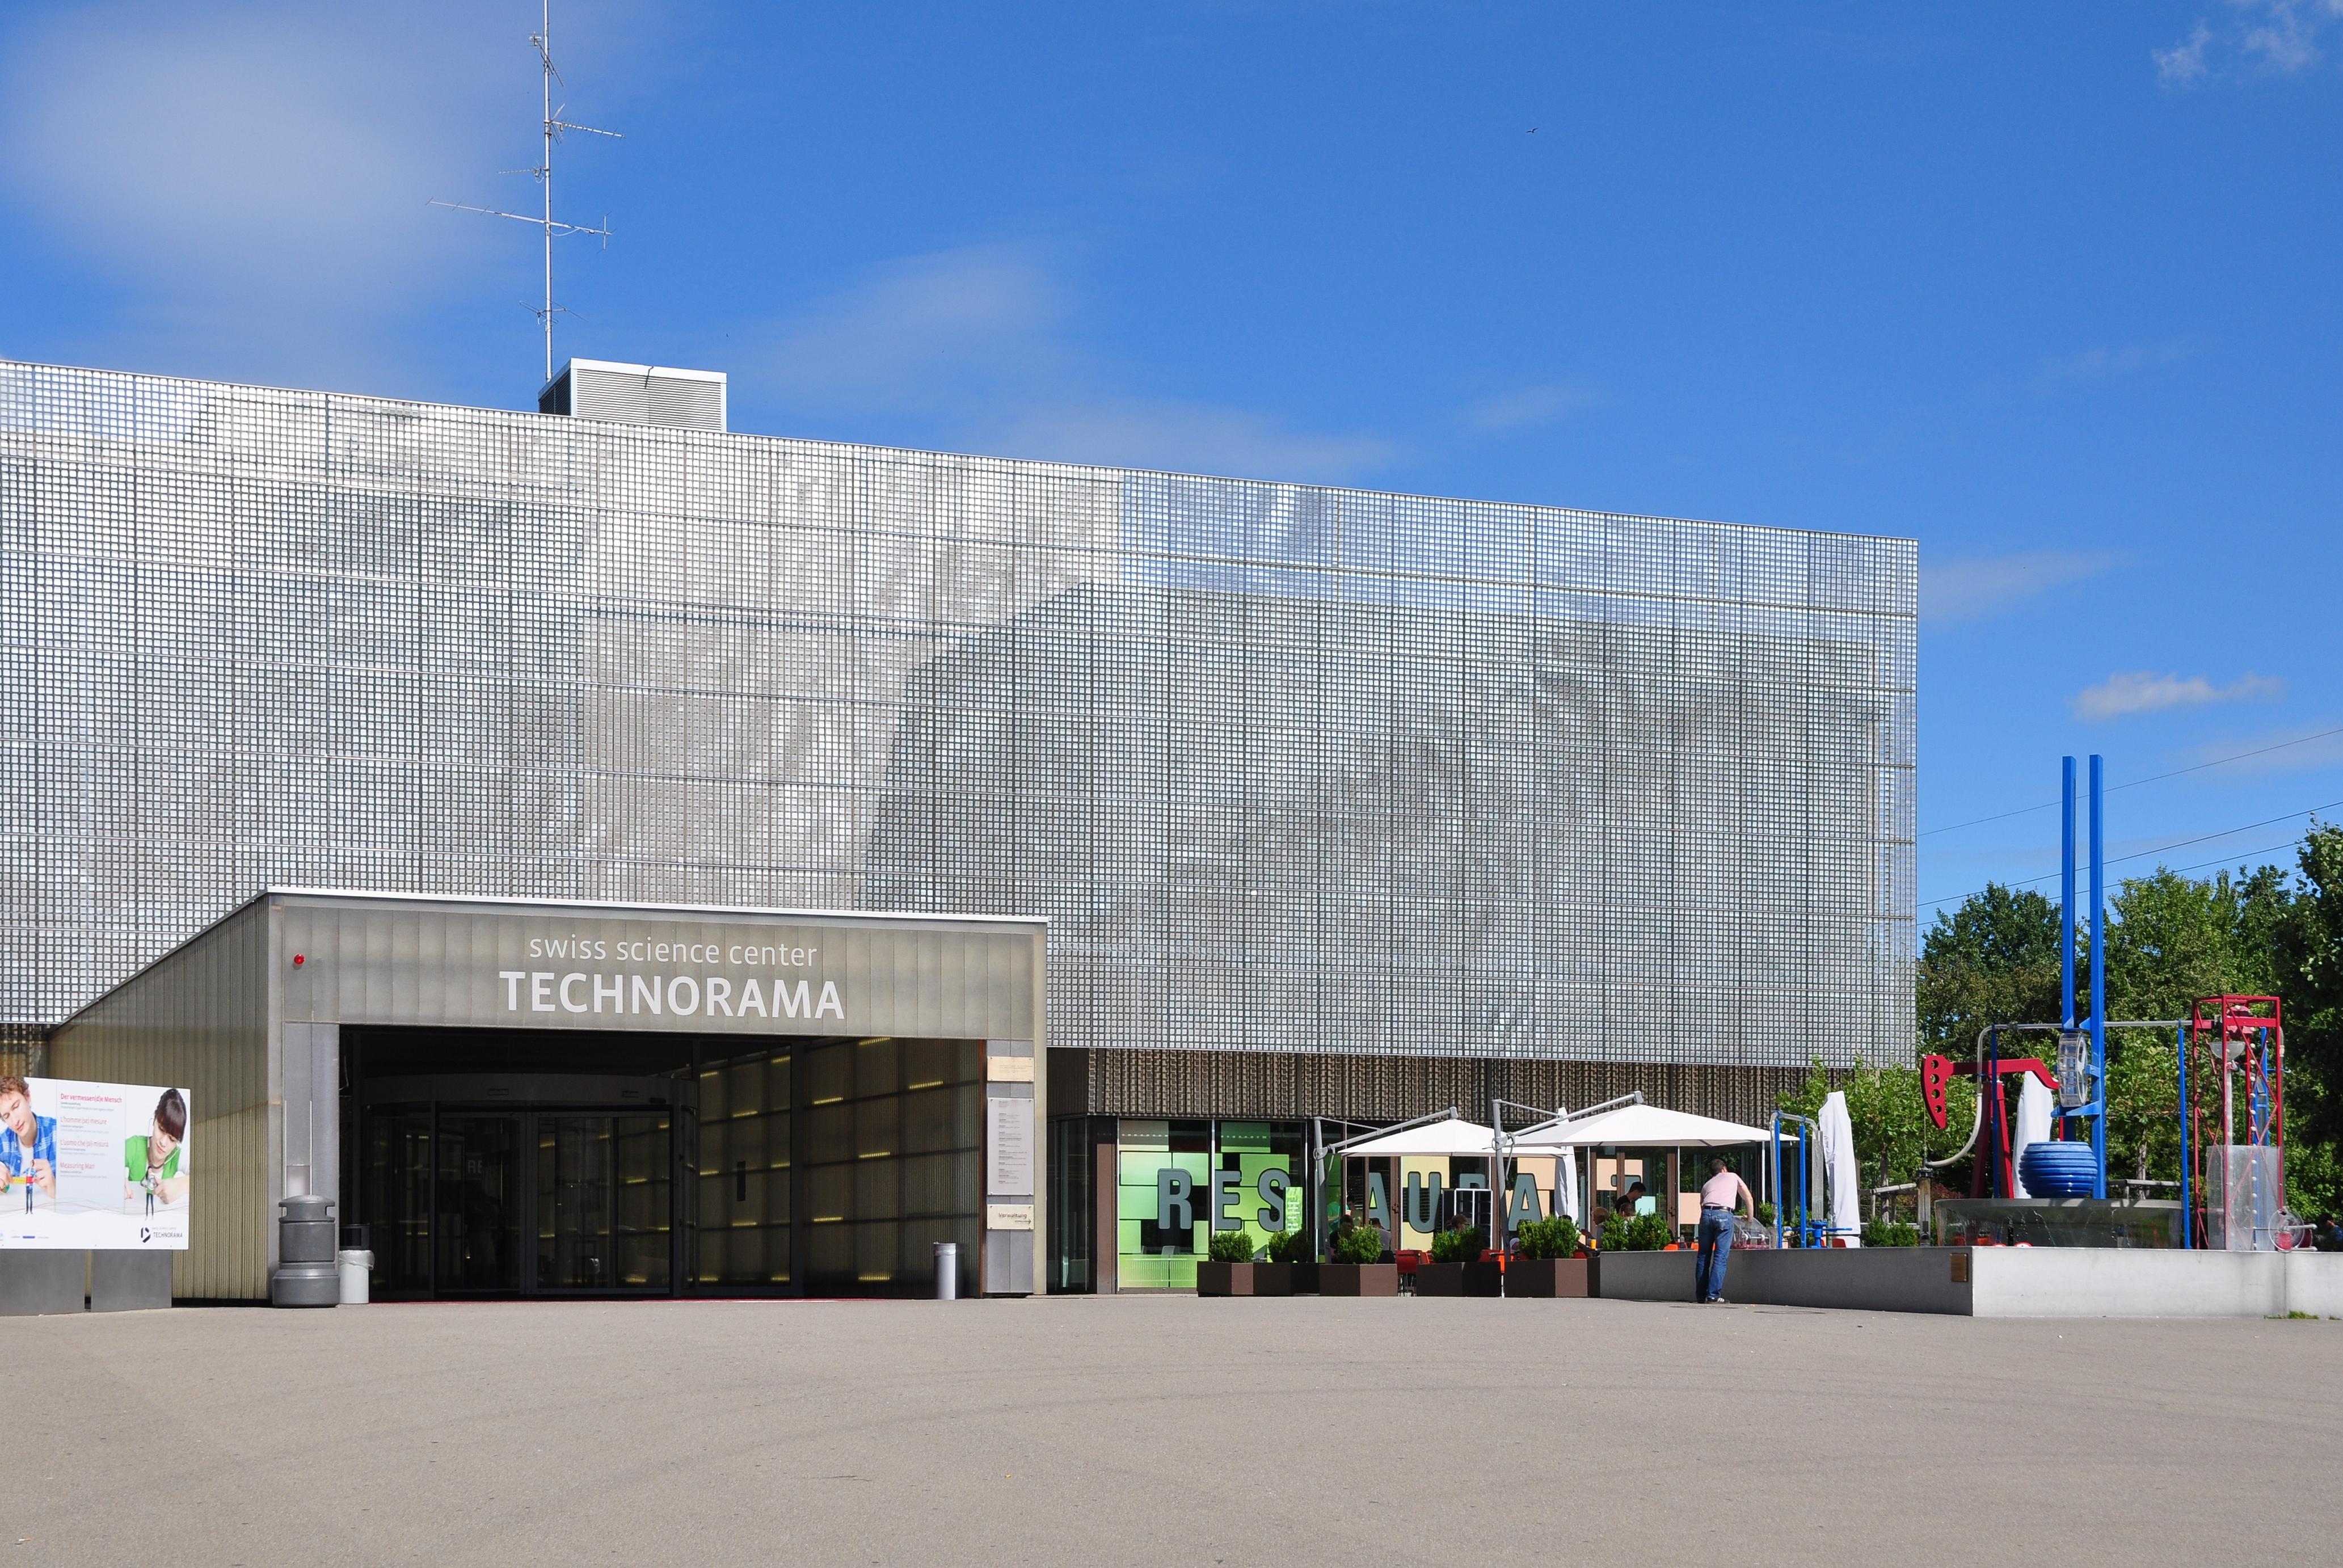 Google Zurich File Technorama Winterthur 2011 09 09 14 18 42 Jpg